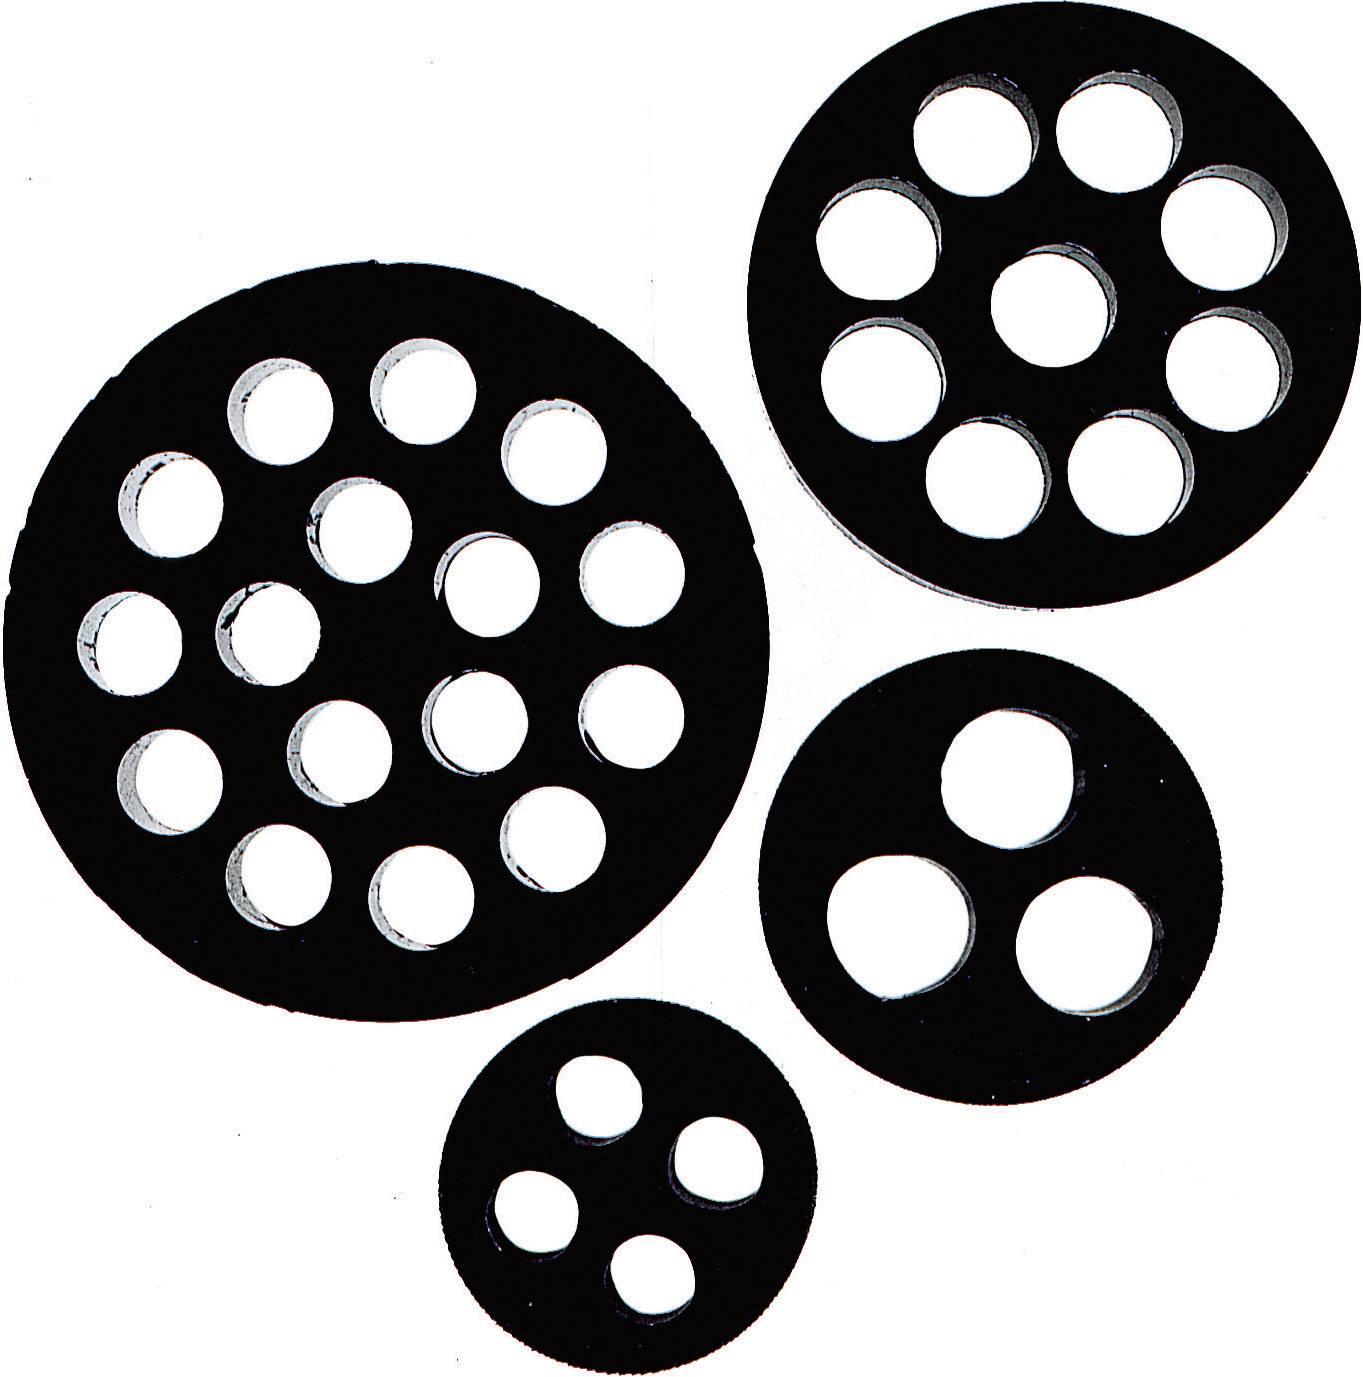 Tesniaca vložka s viacerými priechodmi LappKabel SKINTOP® DIX-M20, M20, nitril kaučuk, 1 ks